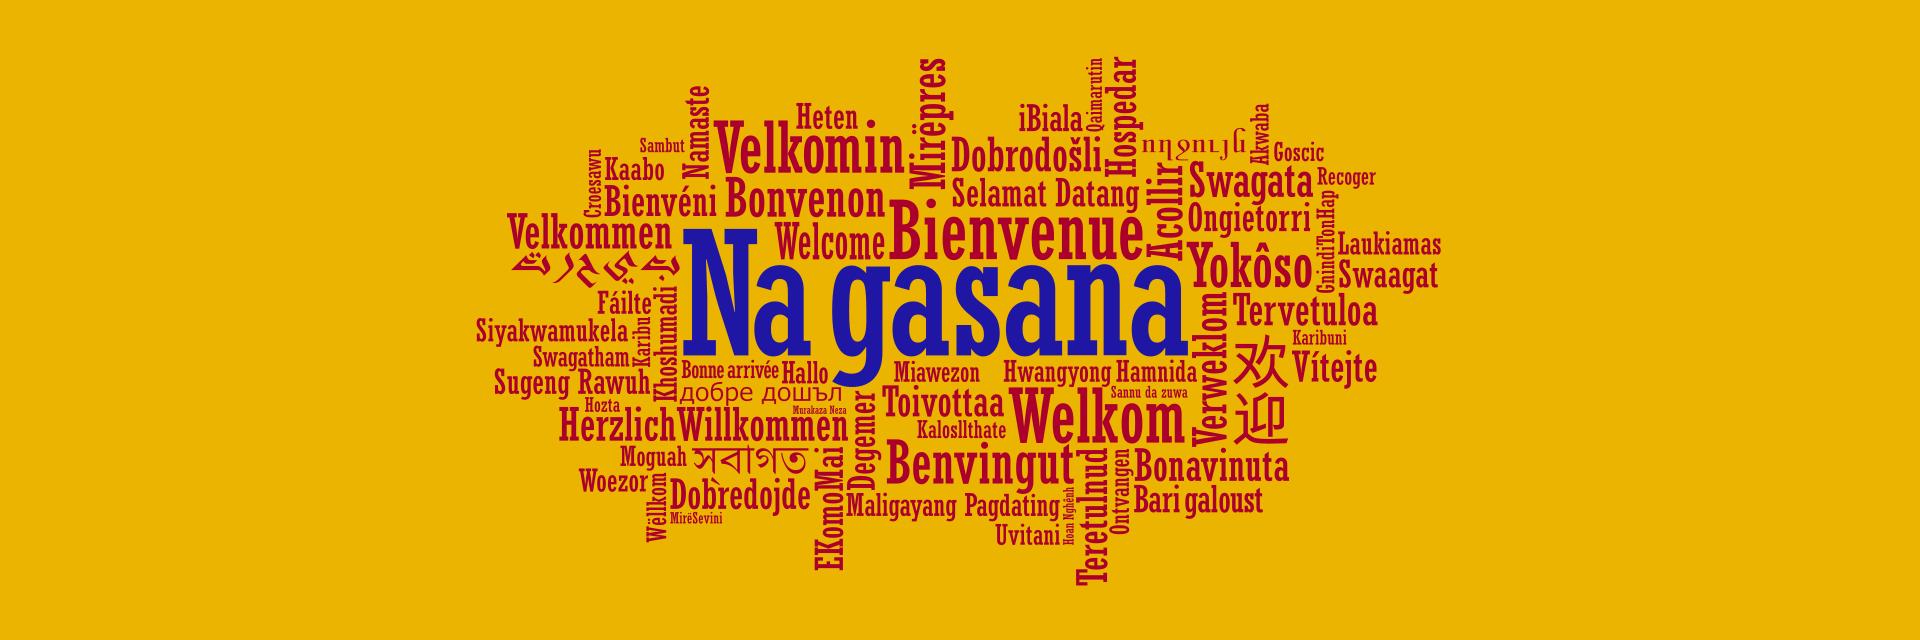 Na Gasana